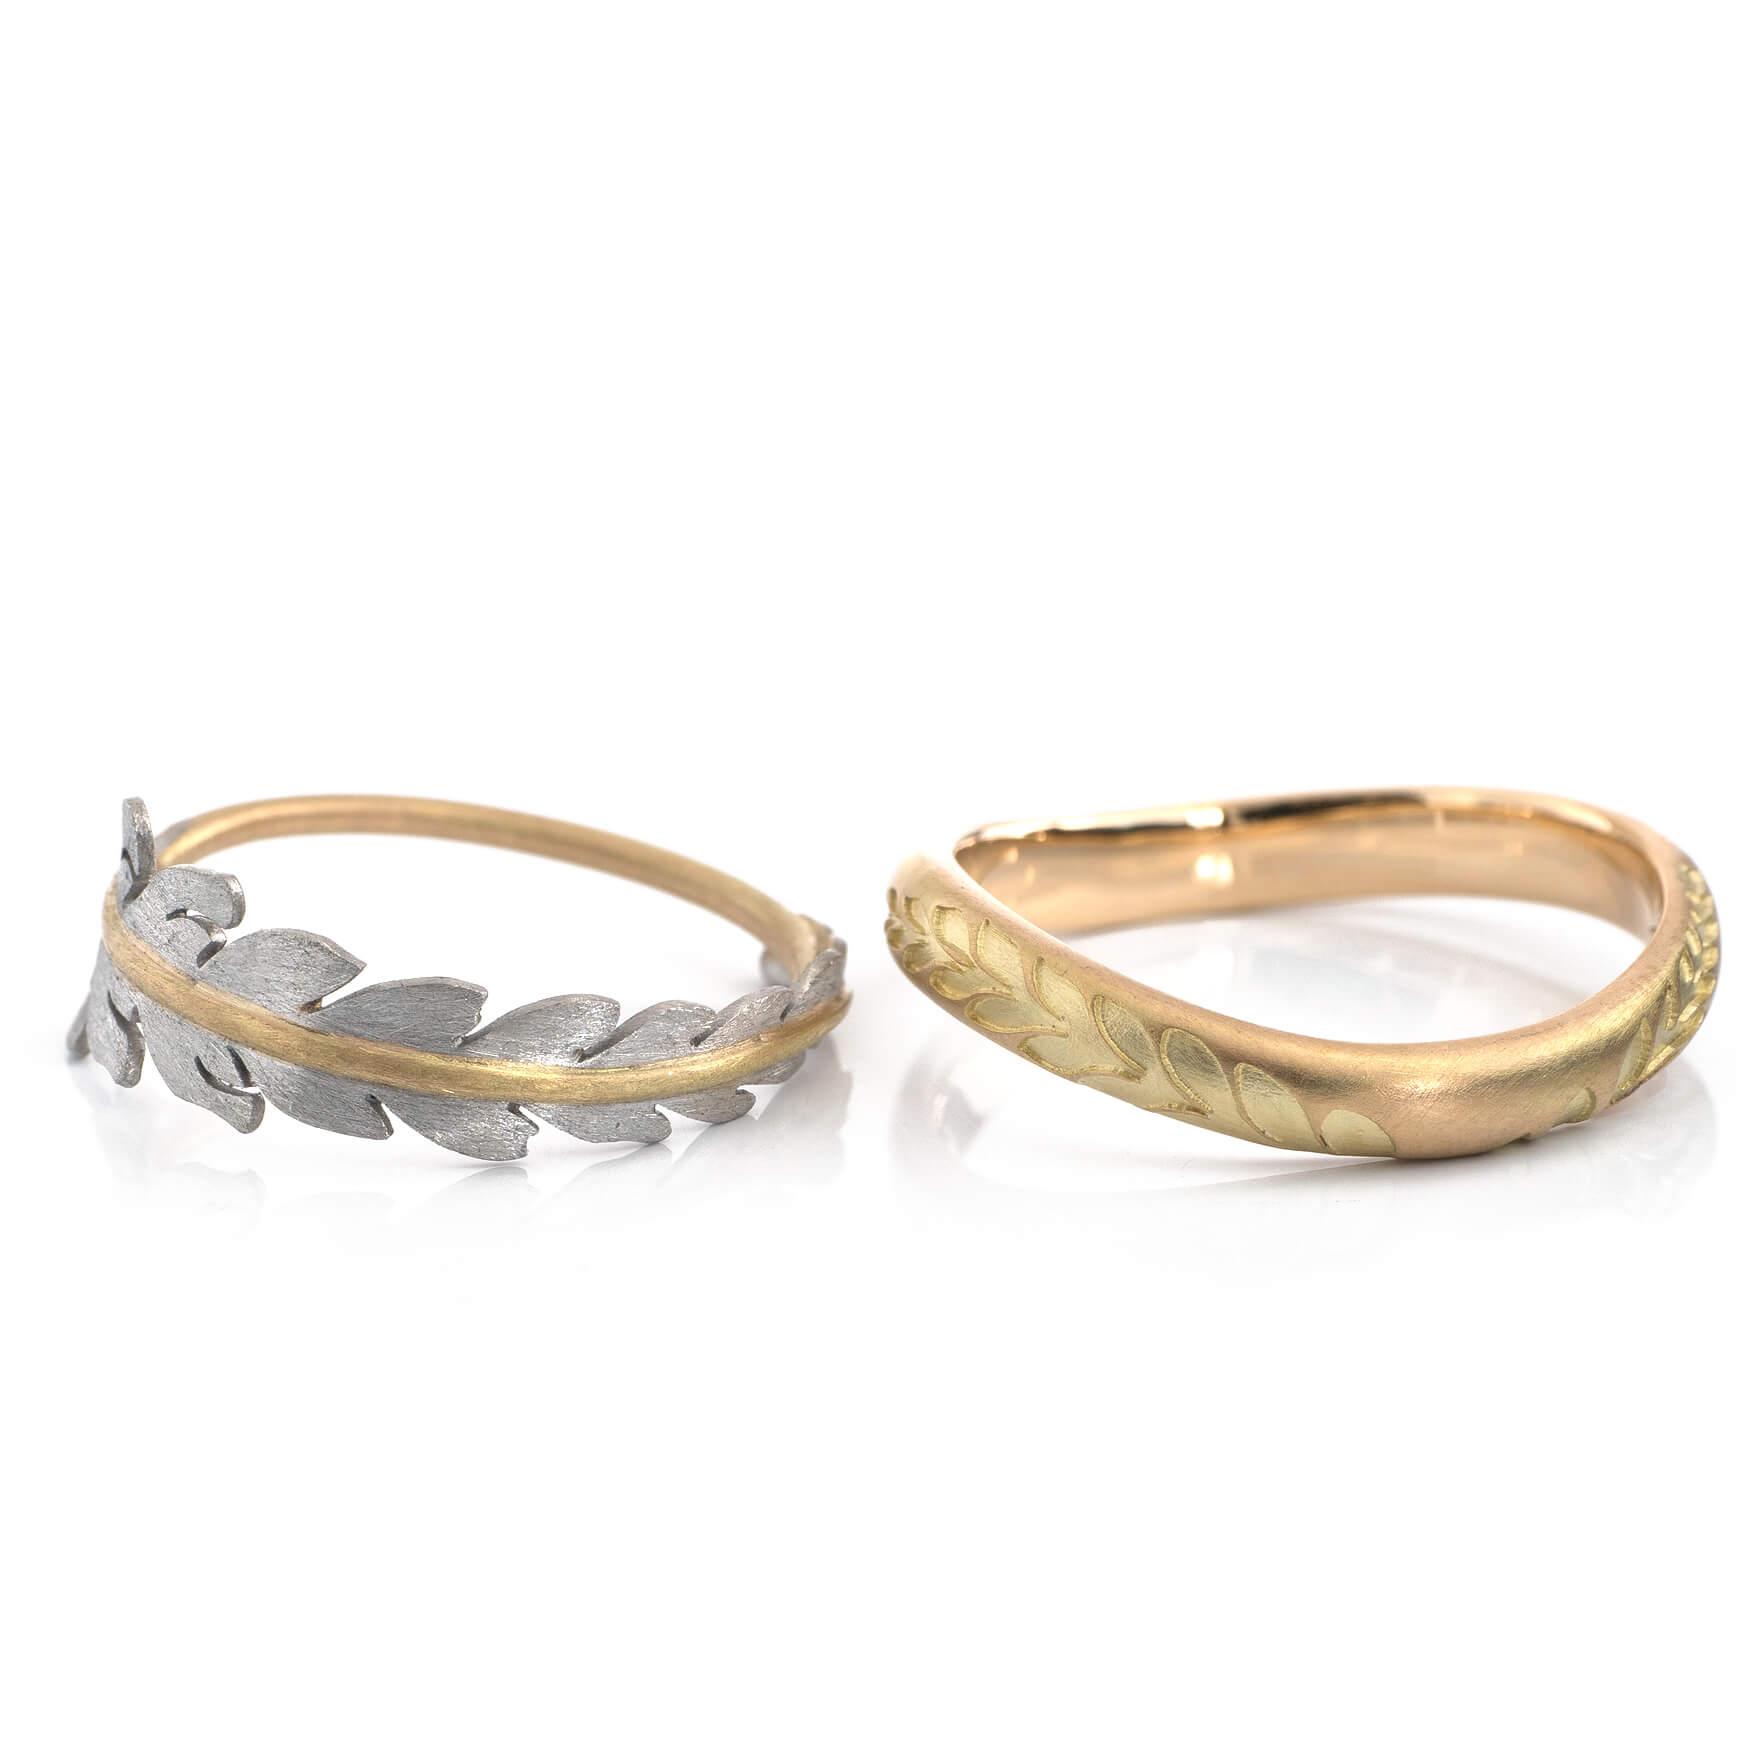 a pair of fern ring/ シダの指輪 #屋久島でつくる結婚指輪